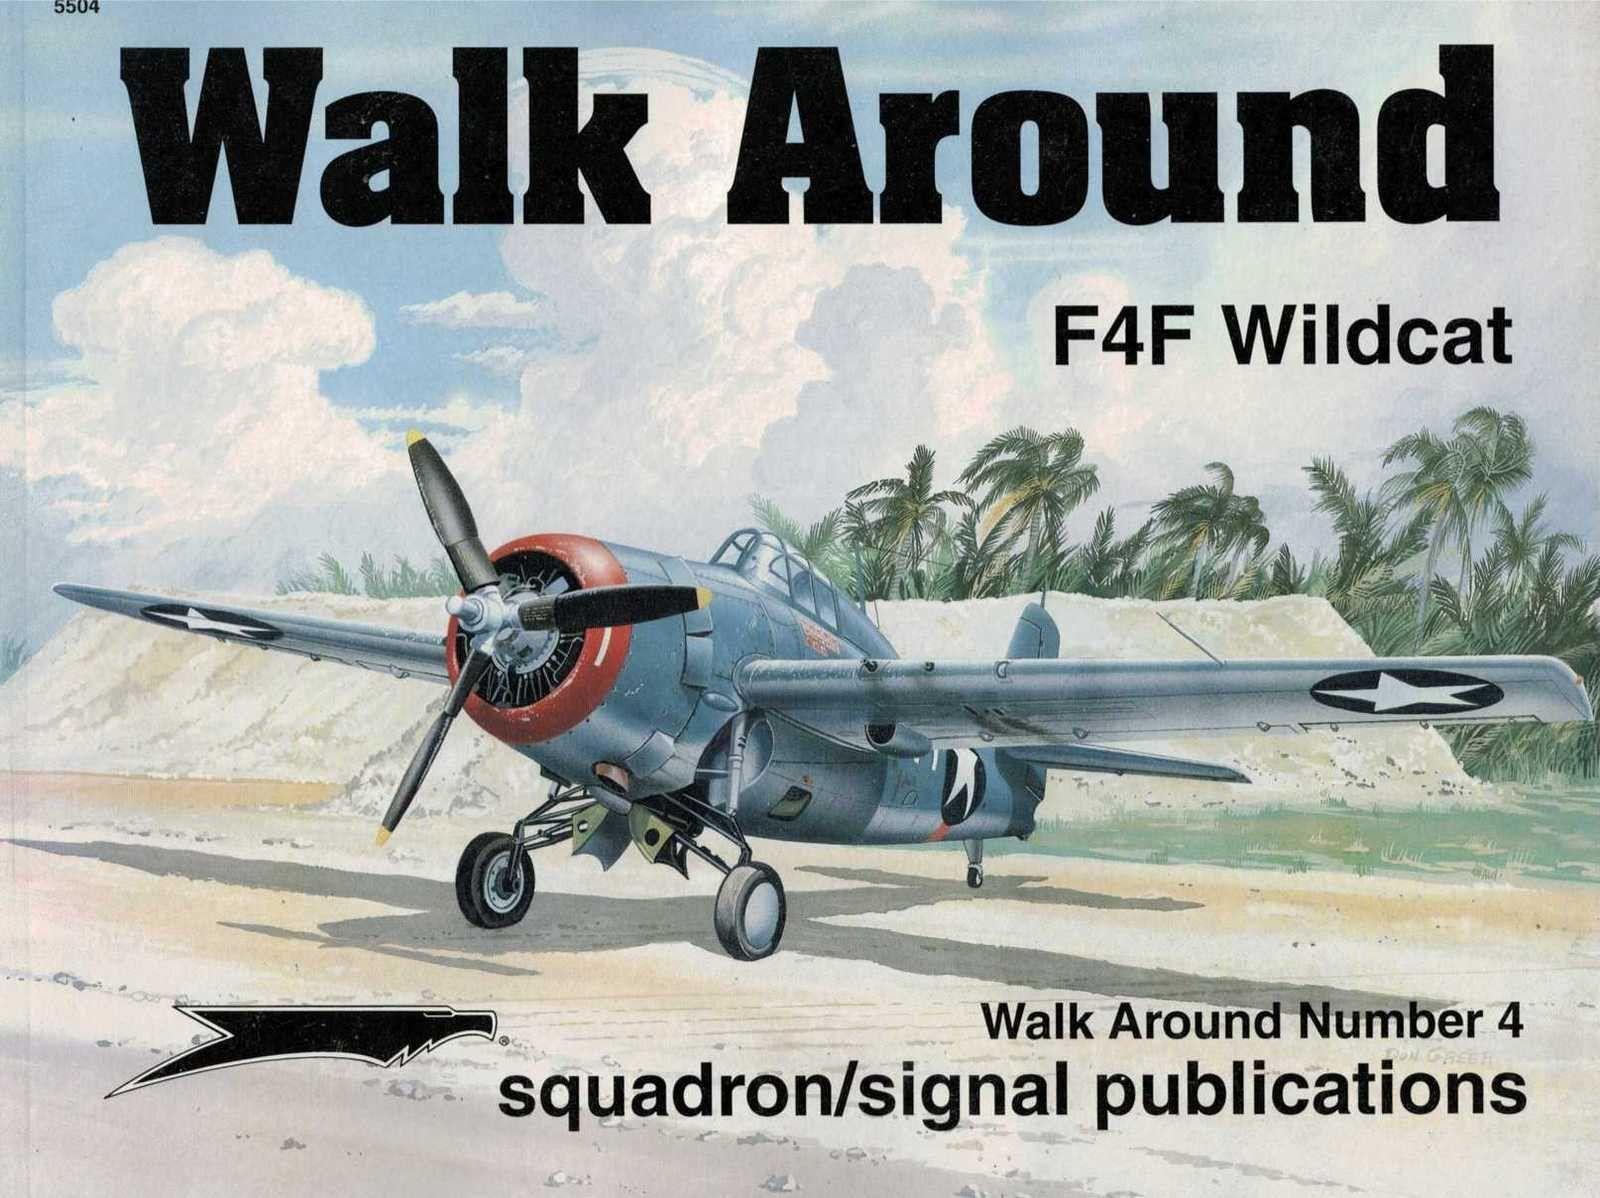 F4F Wildcat Walk Around no. 4 Richard Dann book Squadron Signal airplane